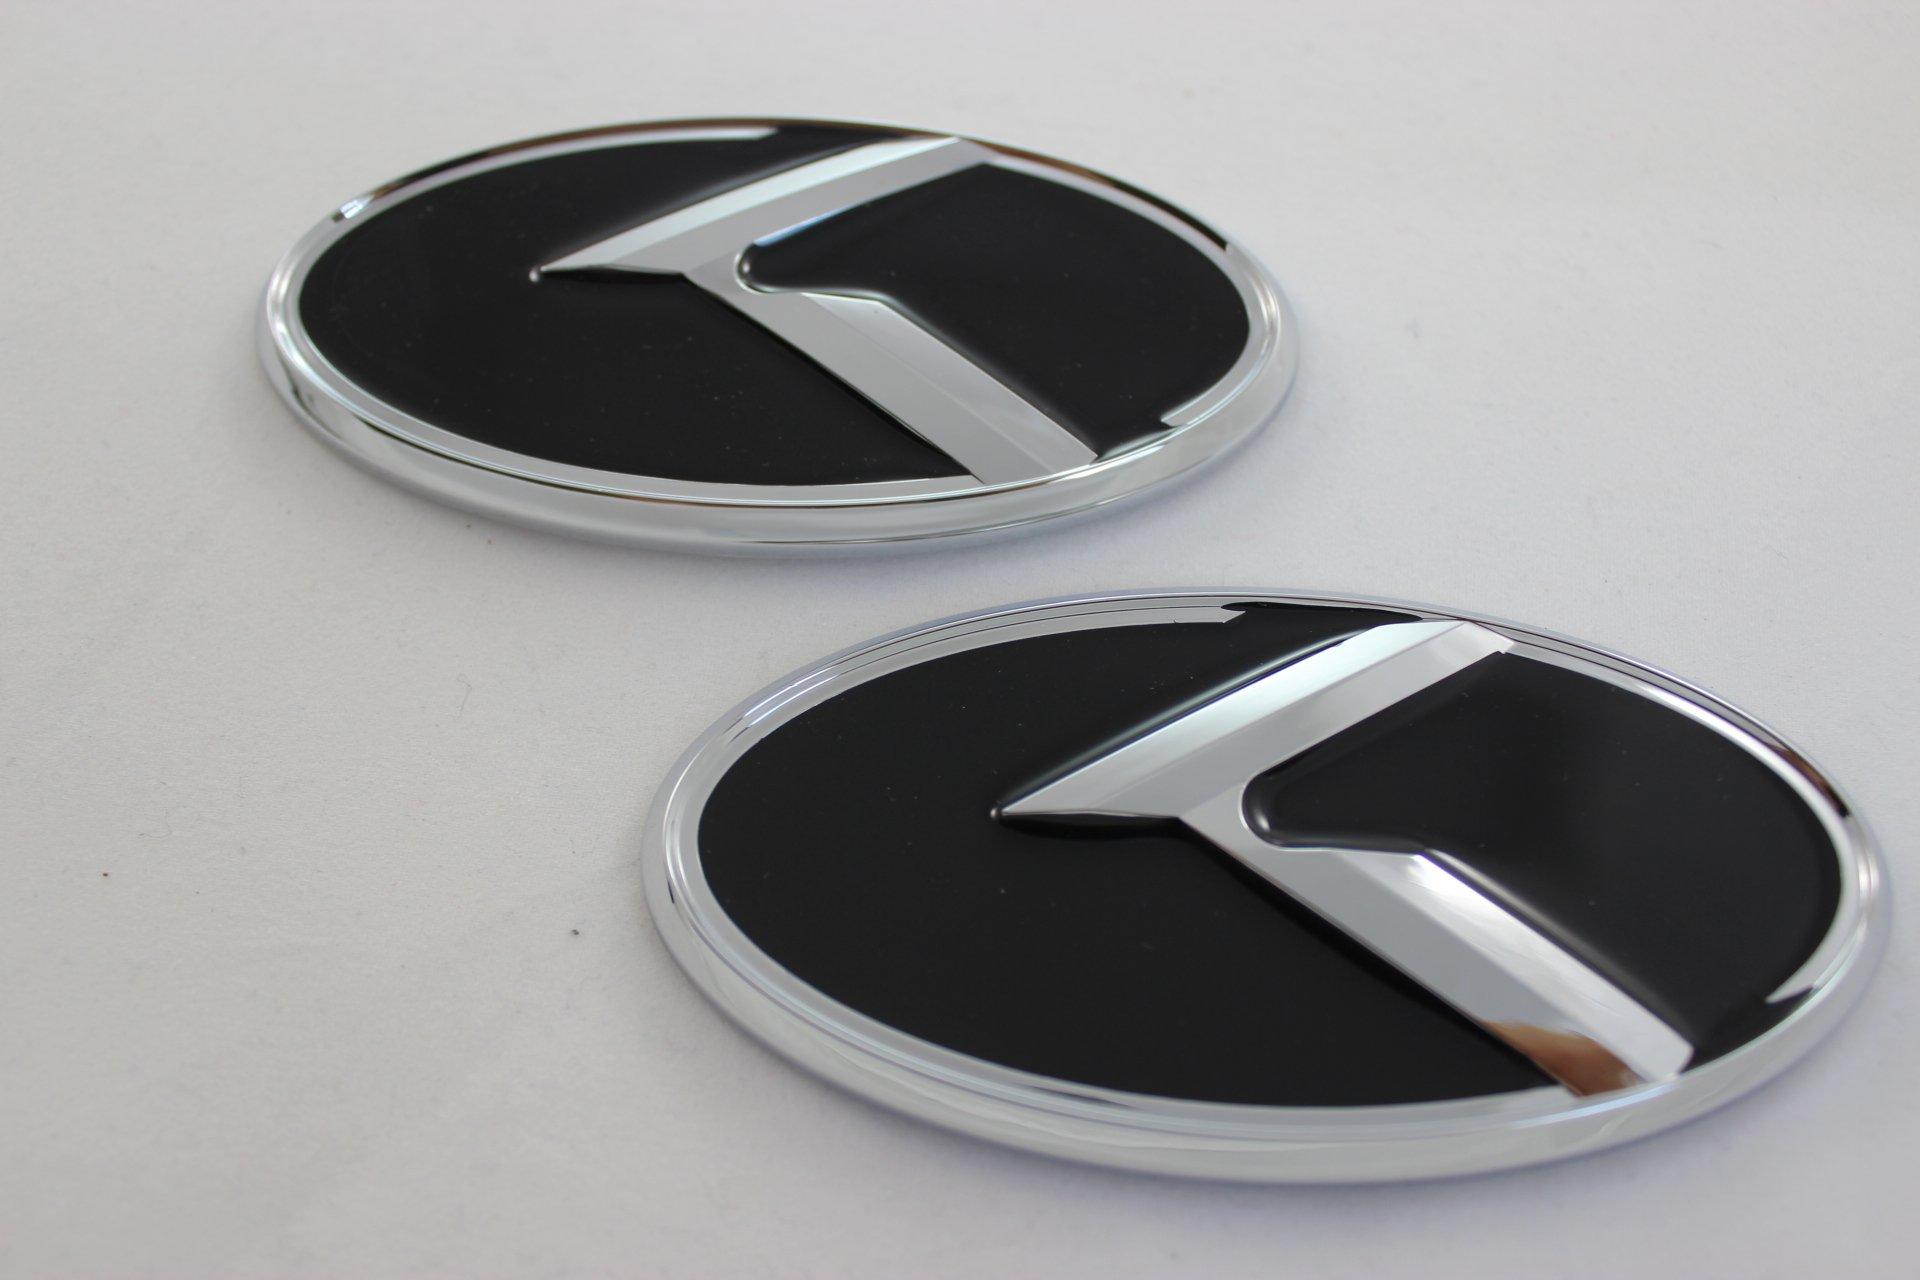 Kia Forte Koup 2pcs Chrome K Logo Vip Speed Badge Emblem Trunk Grille Lid Tail Gate Front Rear Kdm 2011 2012 2013 2014 2015 2016